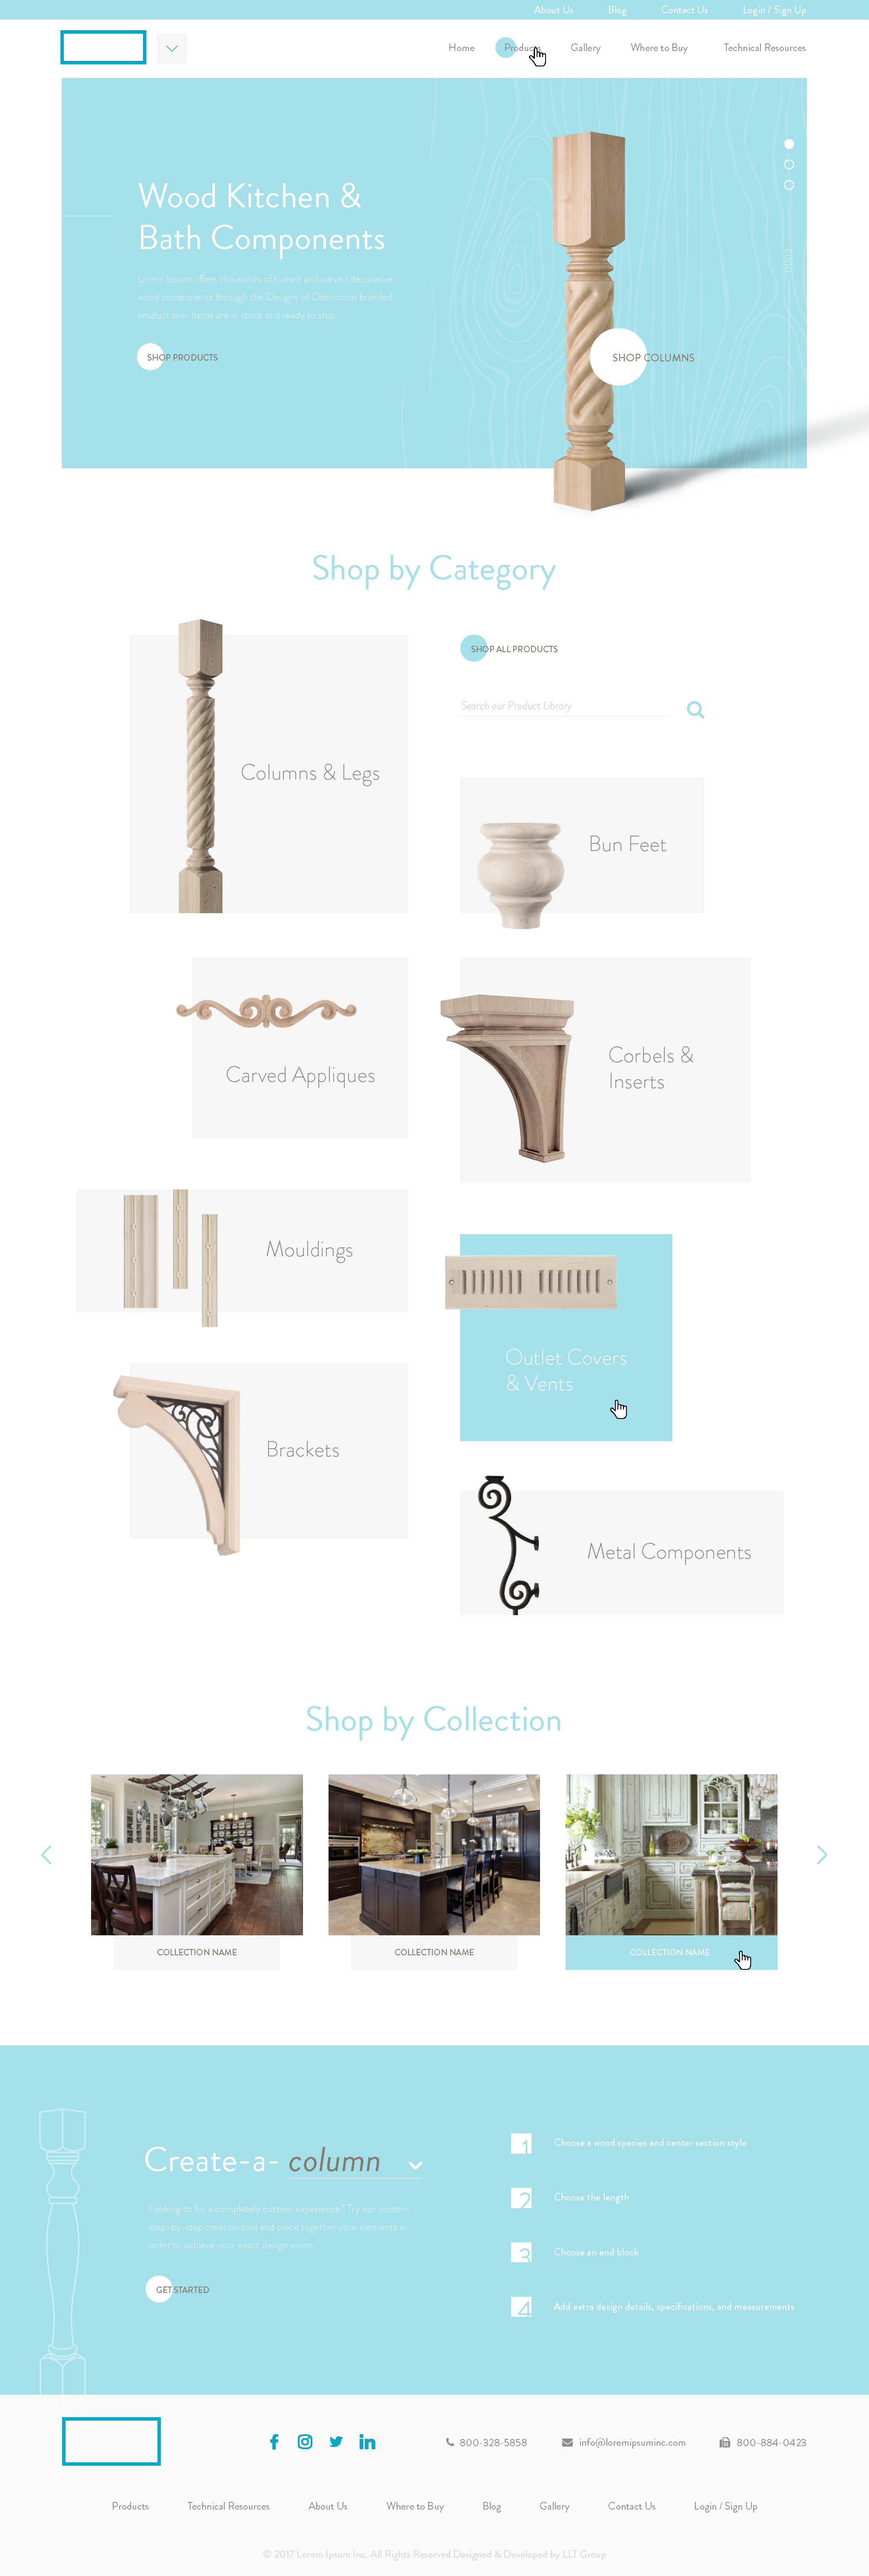 WoodCraft-Home-NoLogo_Page_1.jpg